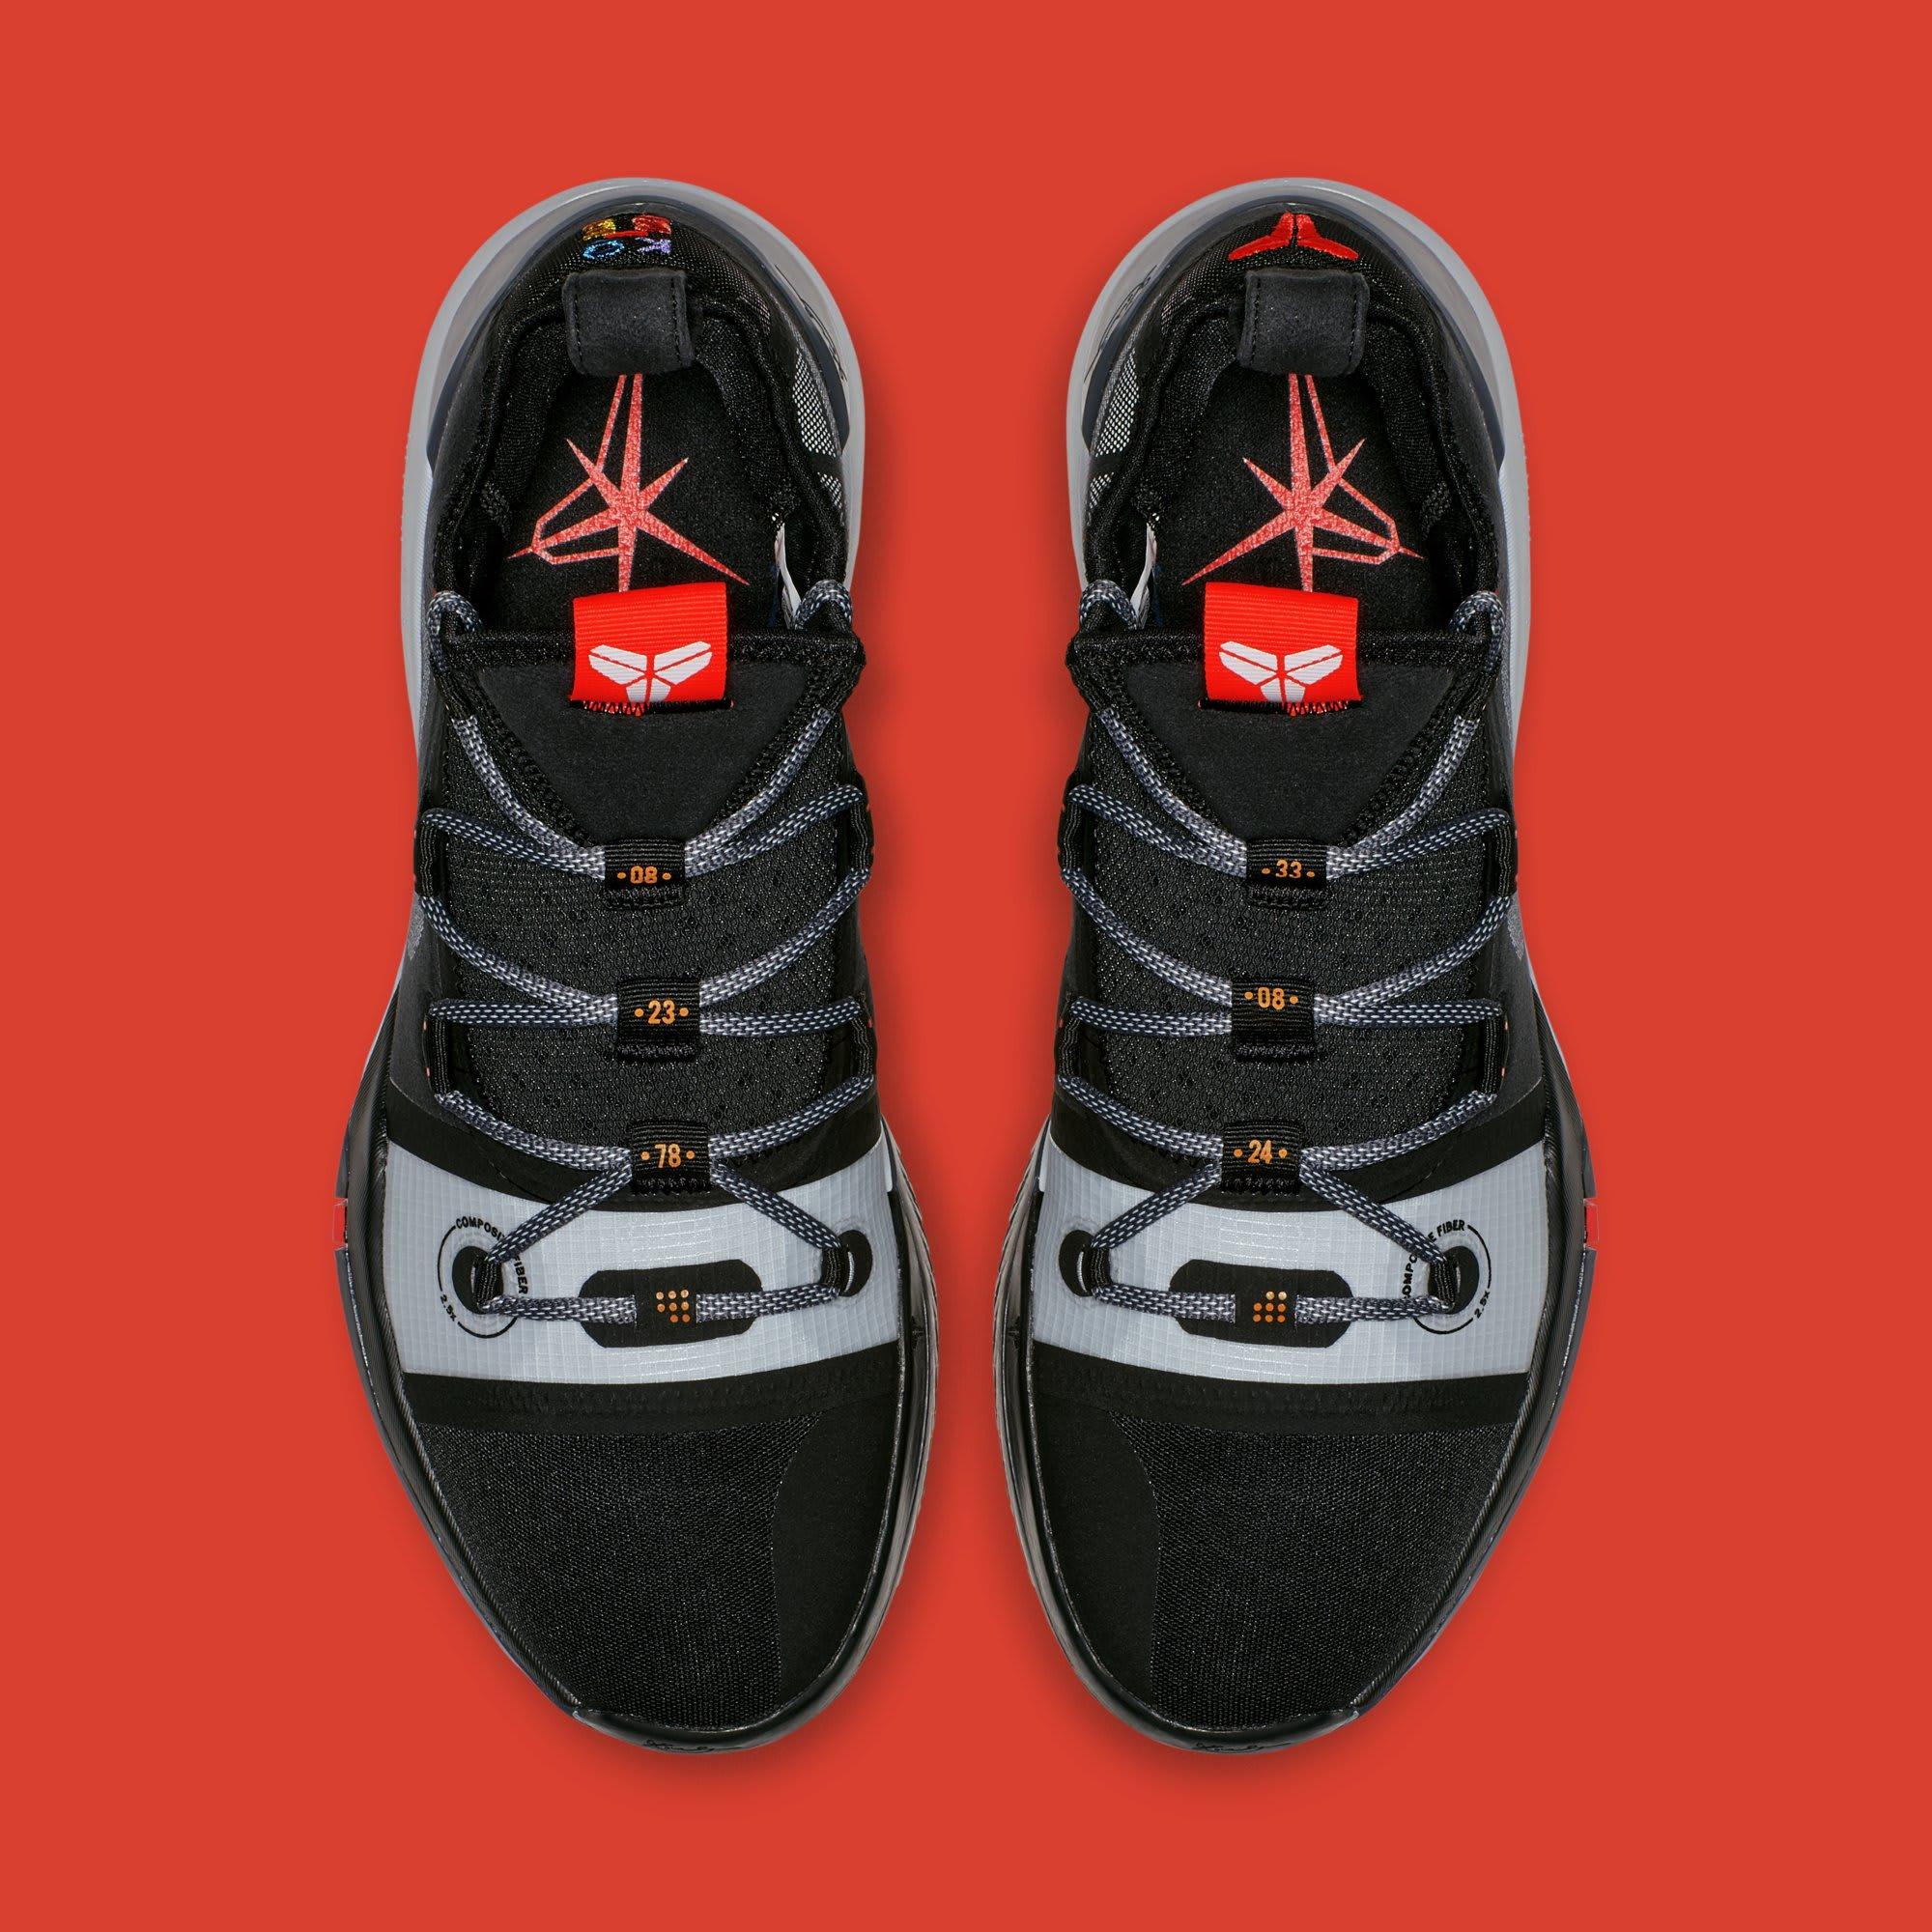 huge selection of 5b7a6 dae24 Image via Nike Nike Kobe AD  Black Multi  AV3555-001 (Top)